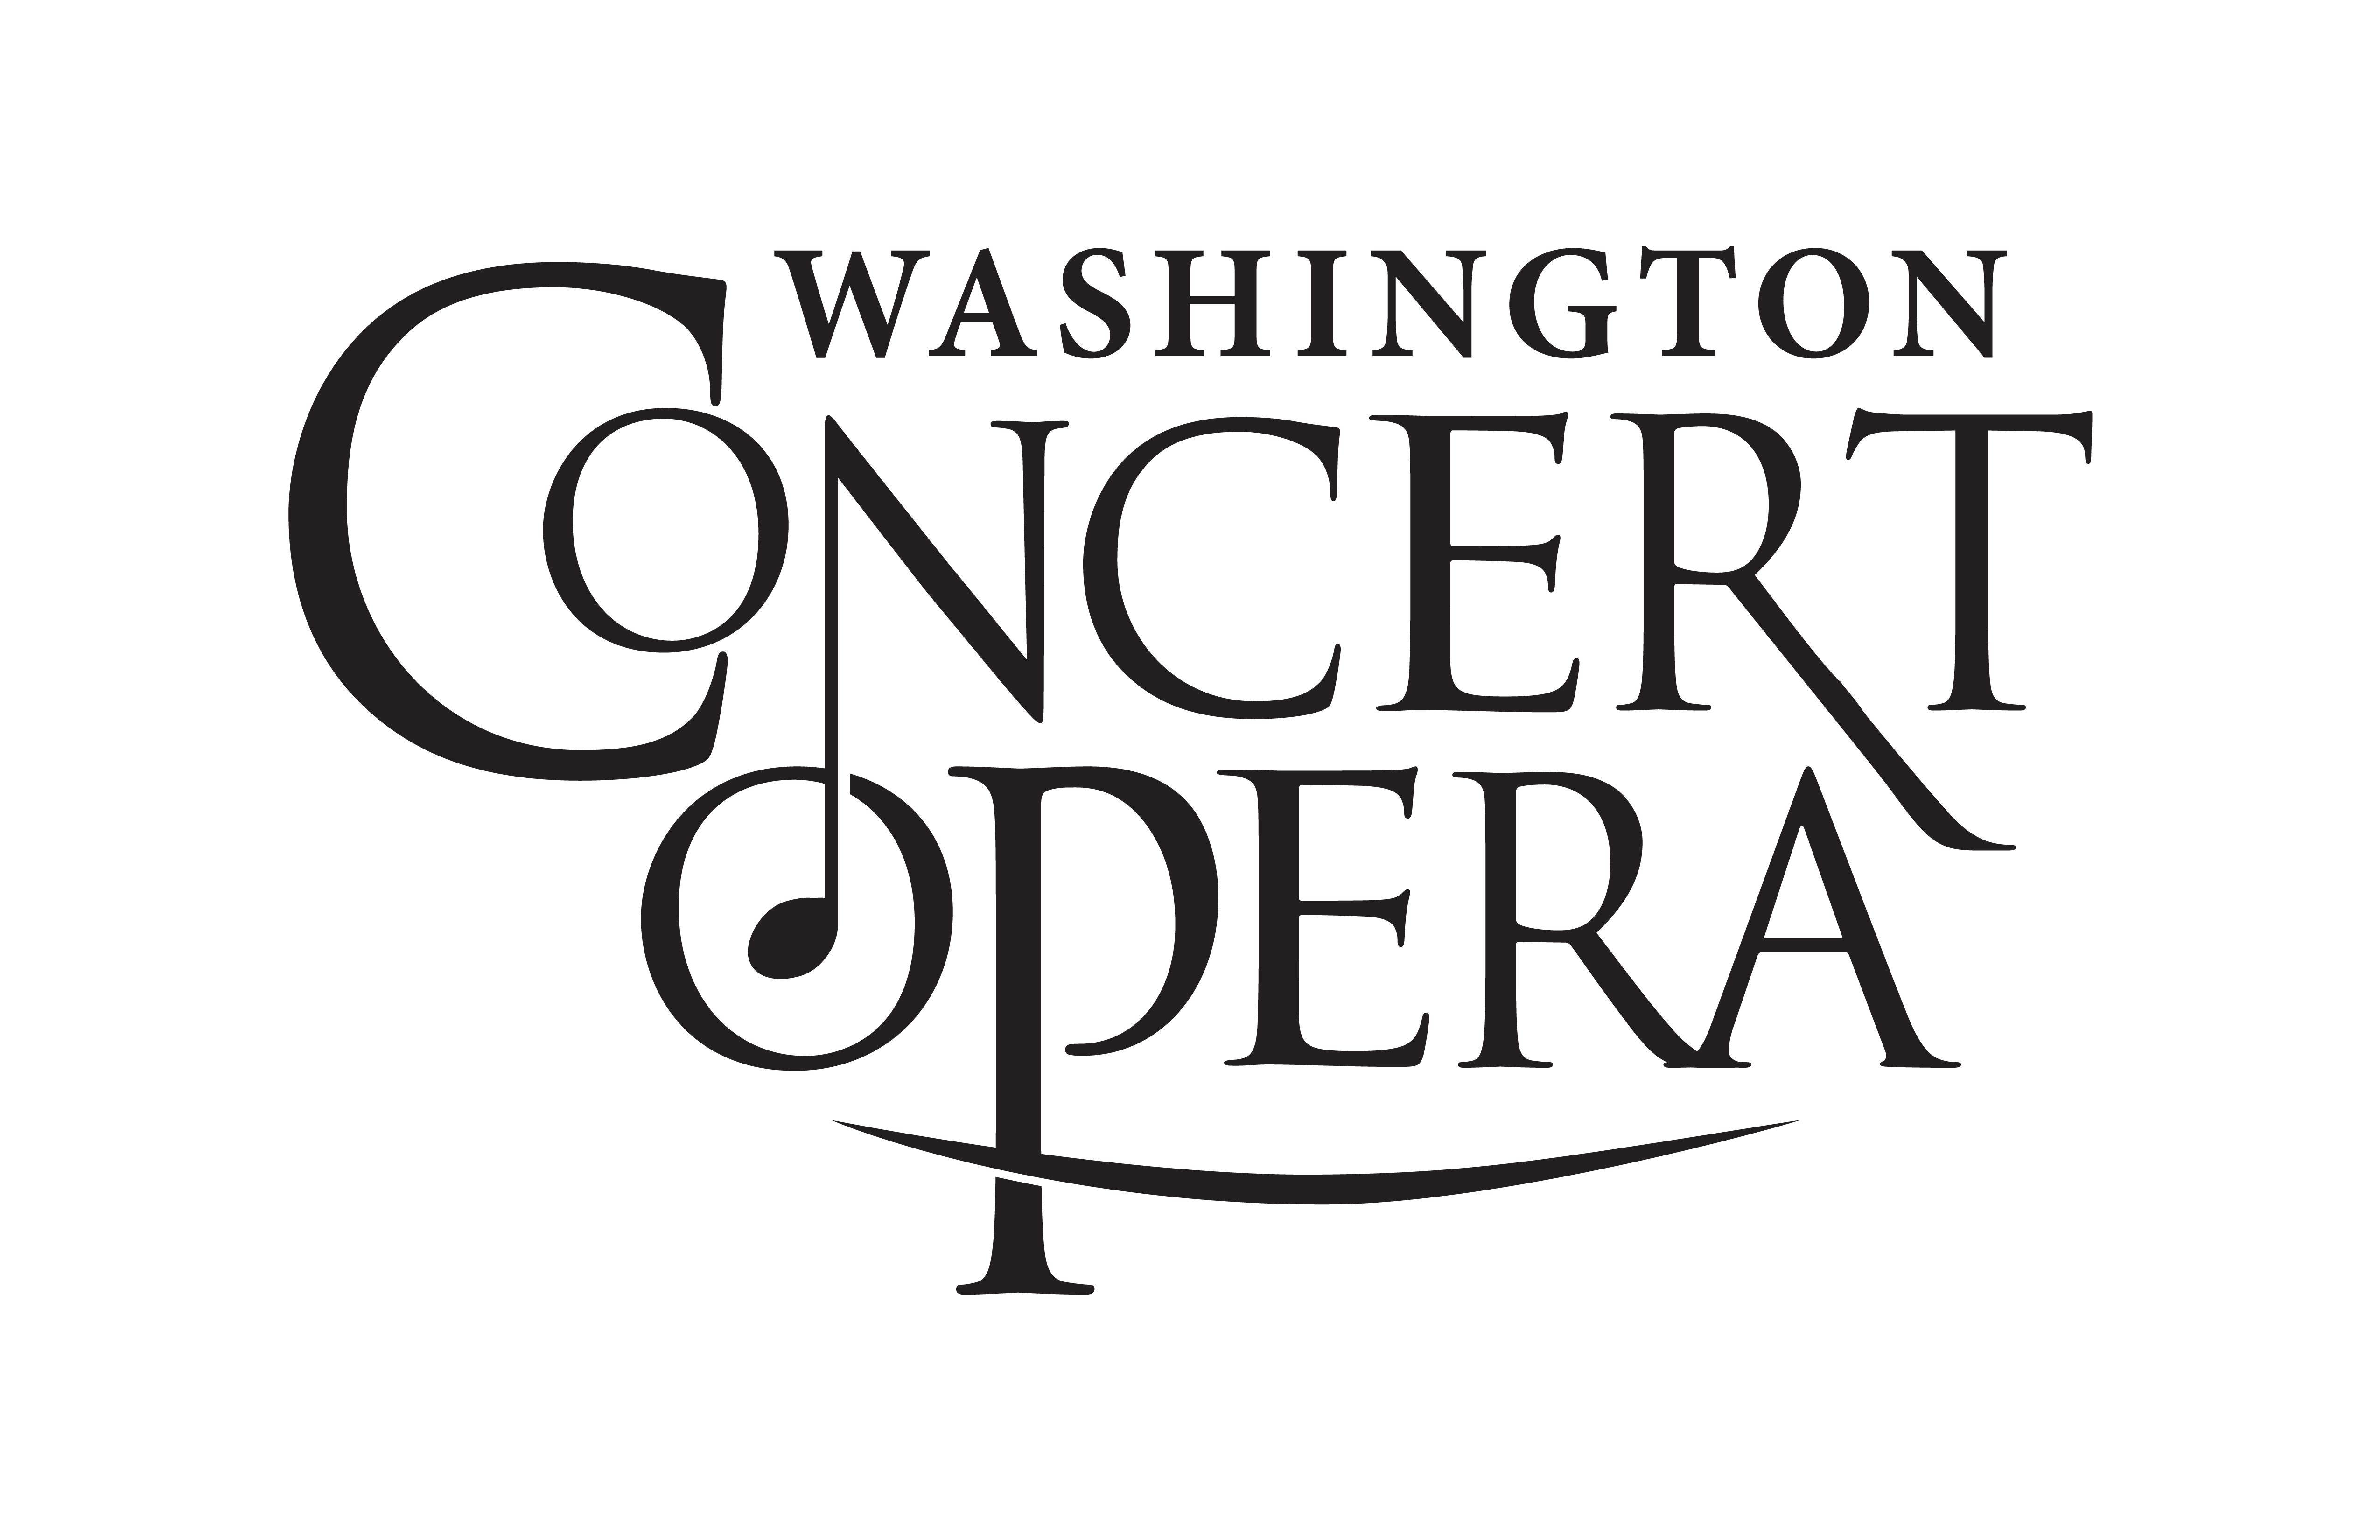 WCO Logo Download — Washington Concert Opera